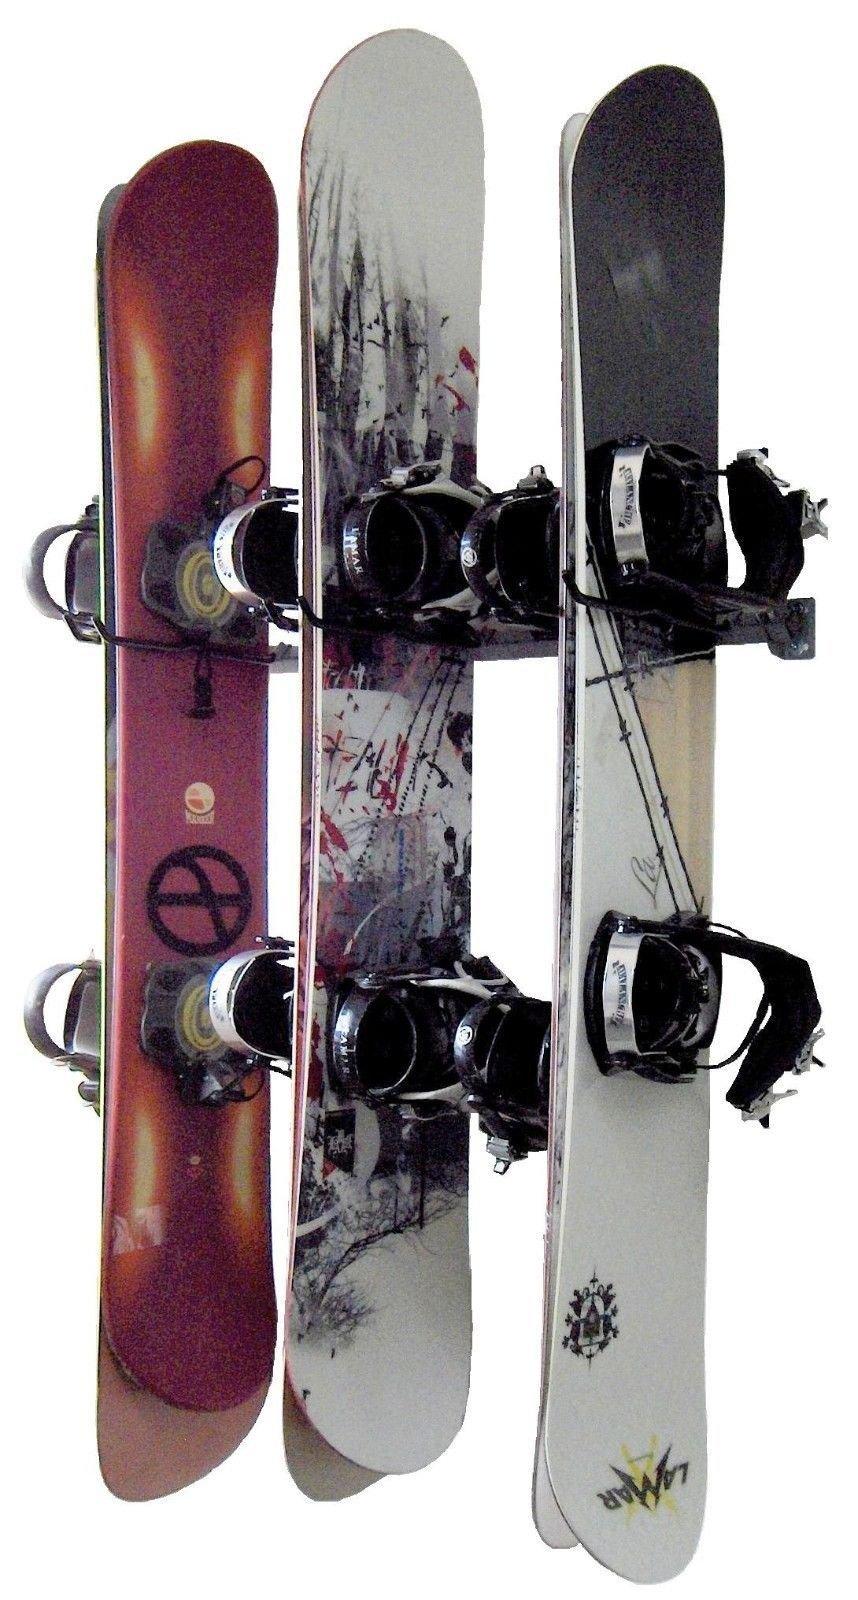 Monkey Bars Snowboard Wall Rack by Monkey Bars